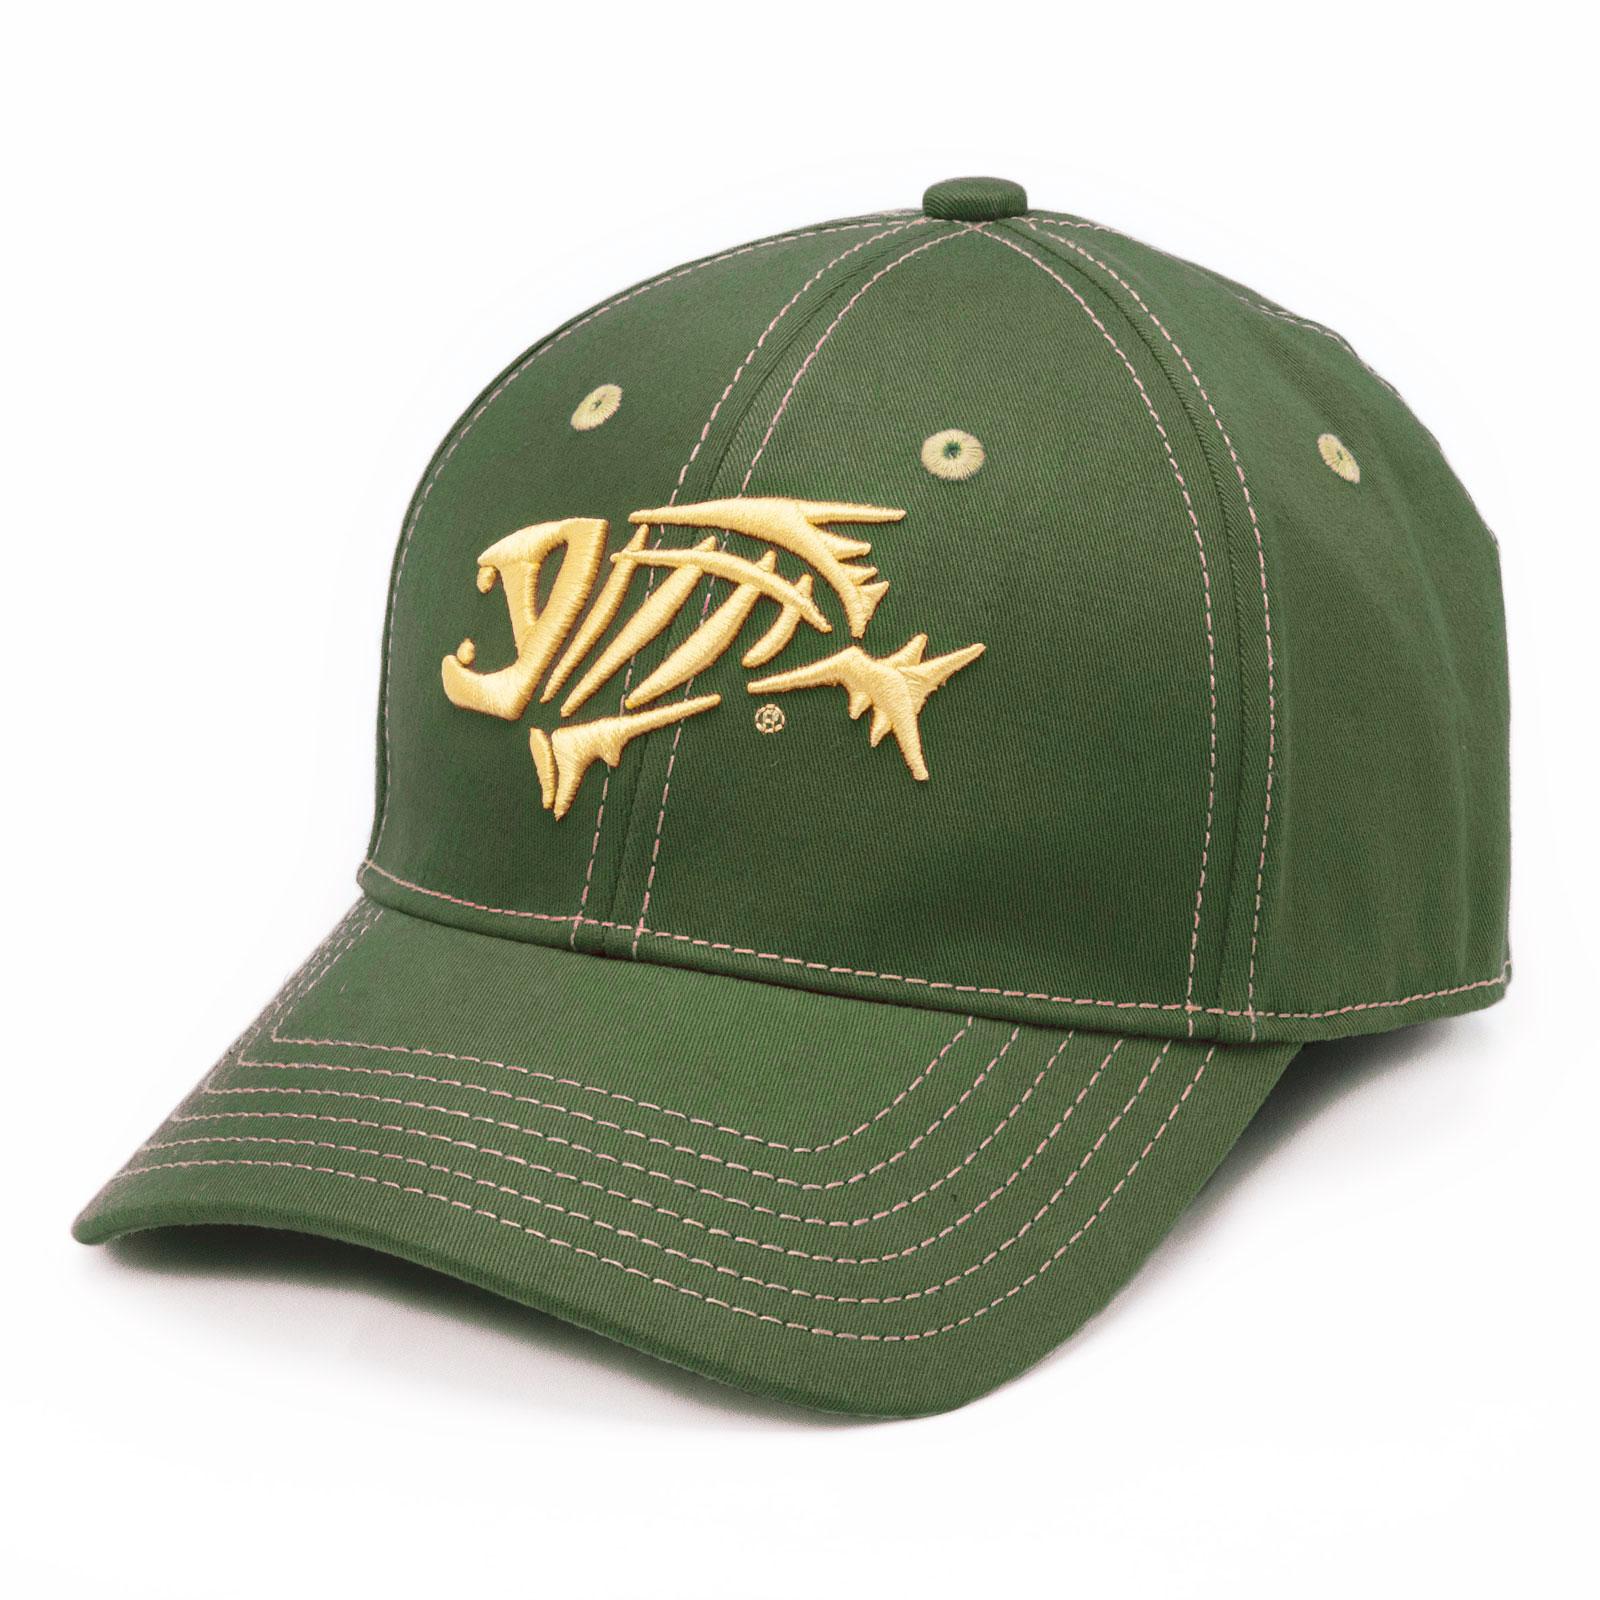 G Loomis A Flex Contrast Stitch Fishing Cap Hat 6 Panel